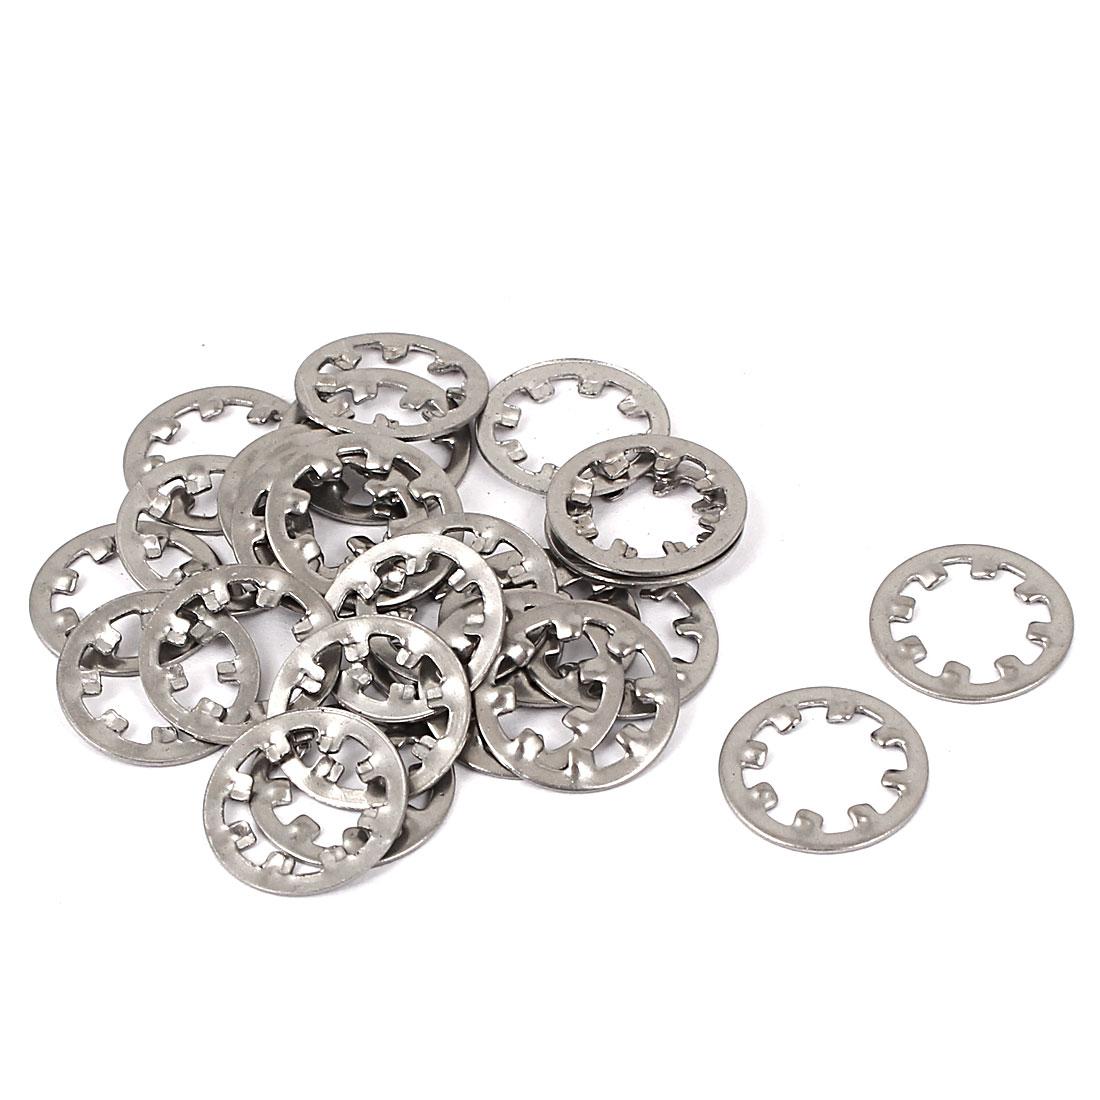 M8 304 Stainless Steel Internal Star Lock Washers 25 Pcs